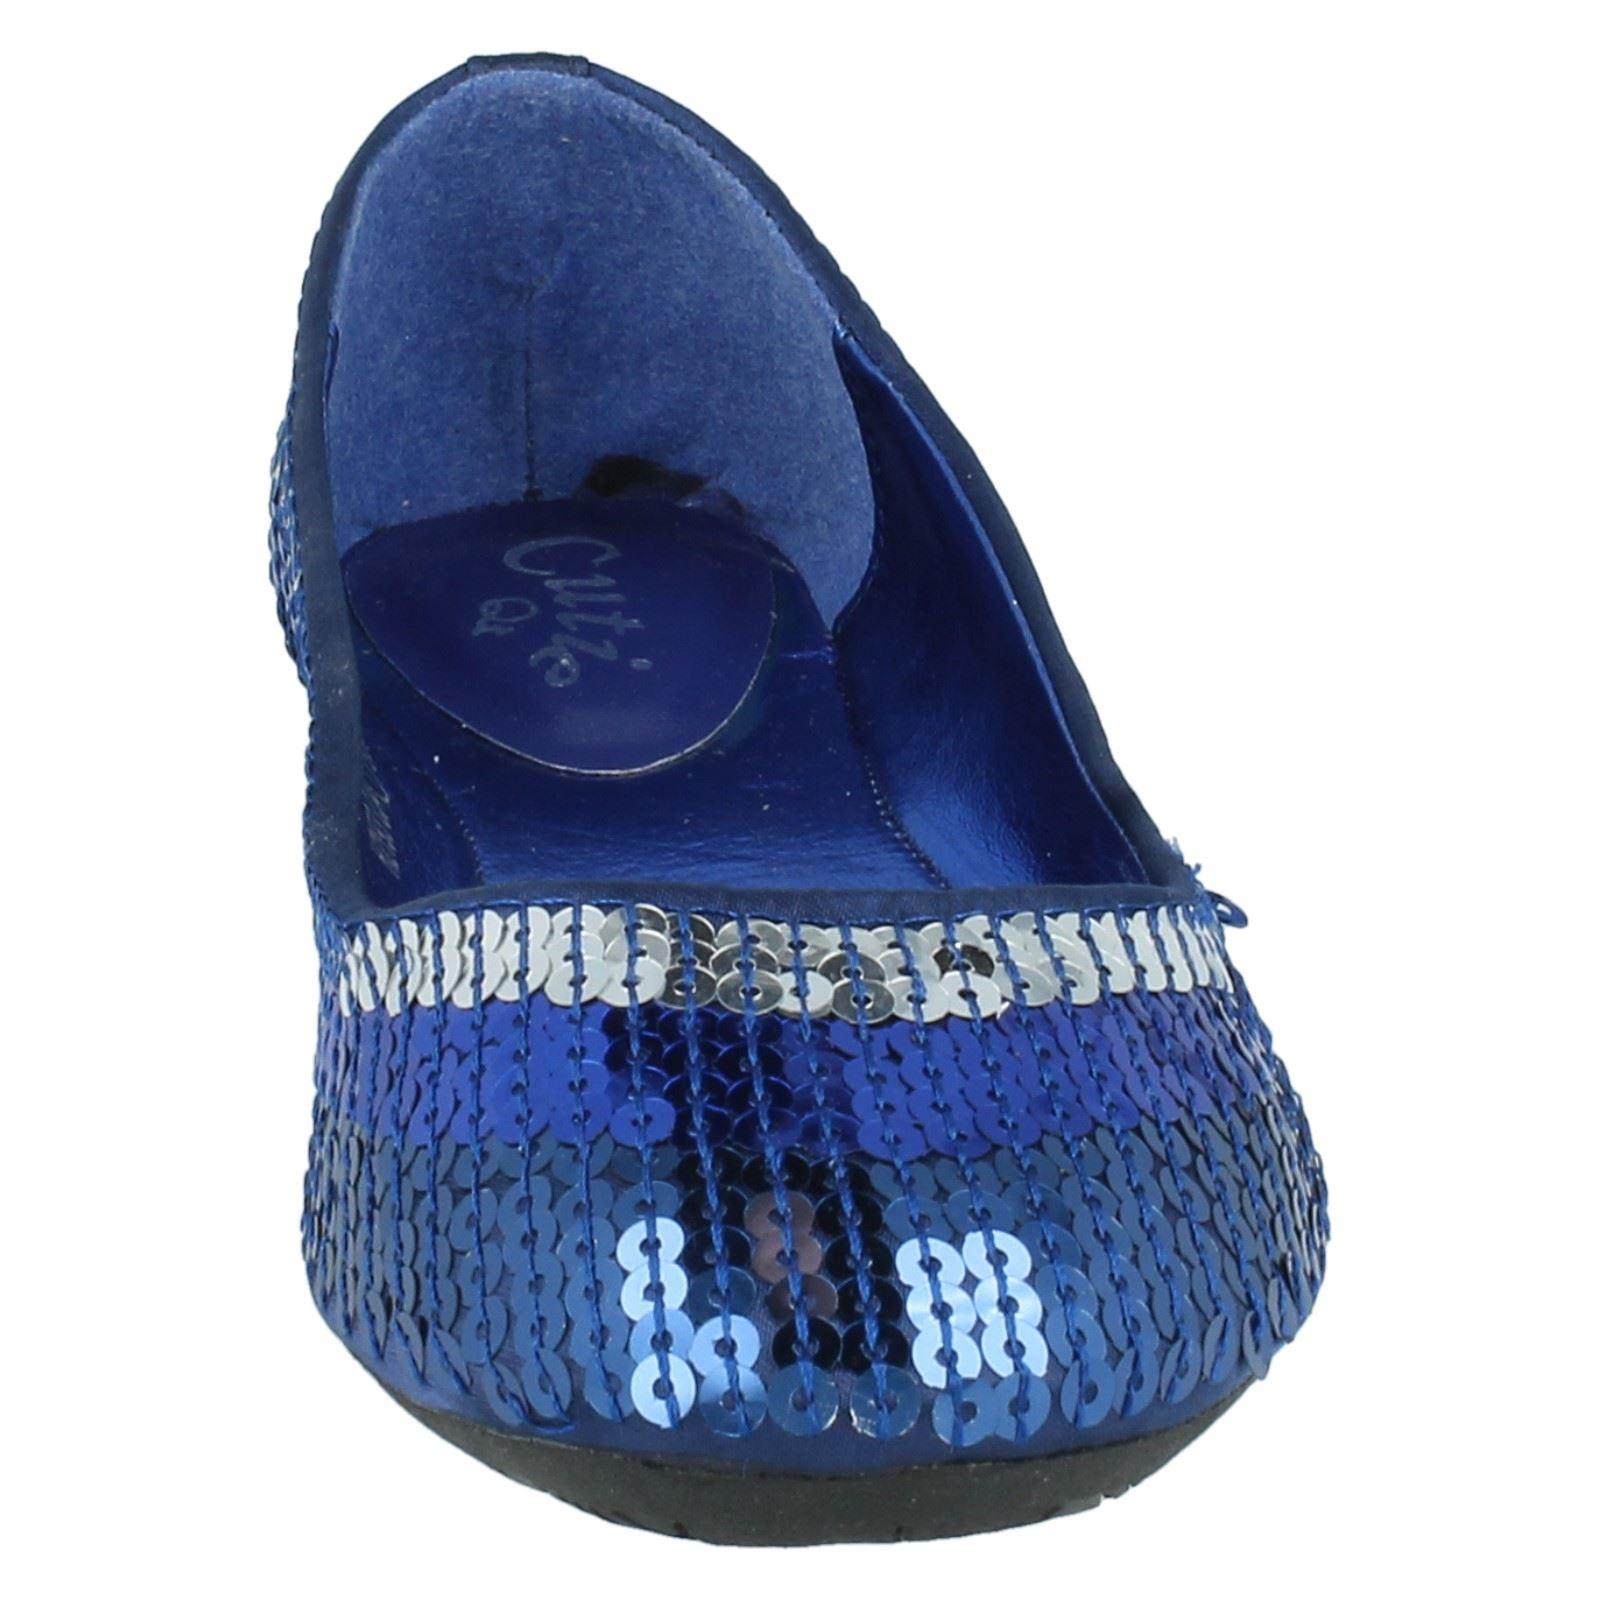 Chicas Cutie Qt Lentejuelas Zapatos h2193